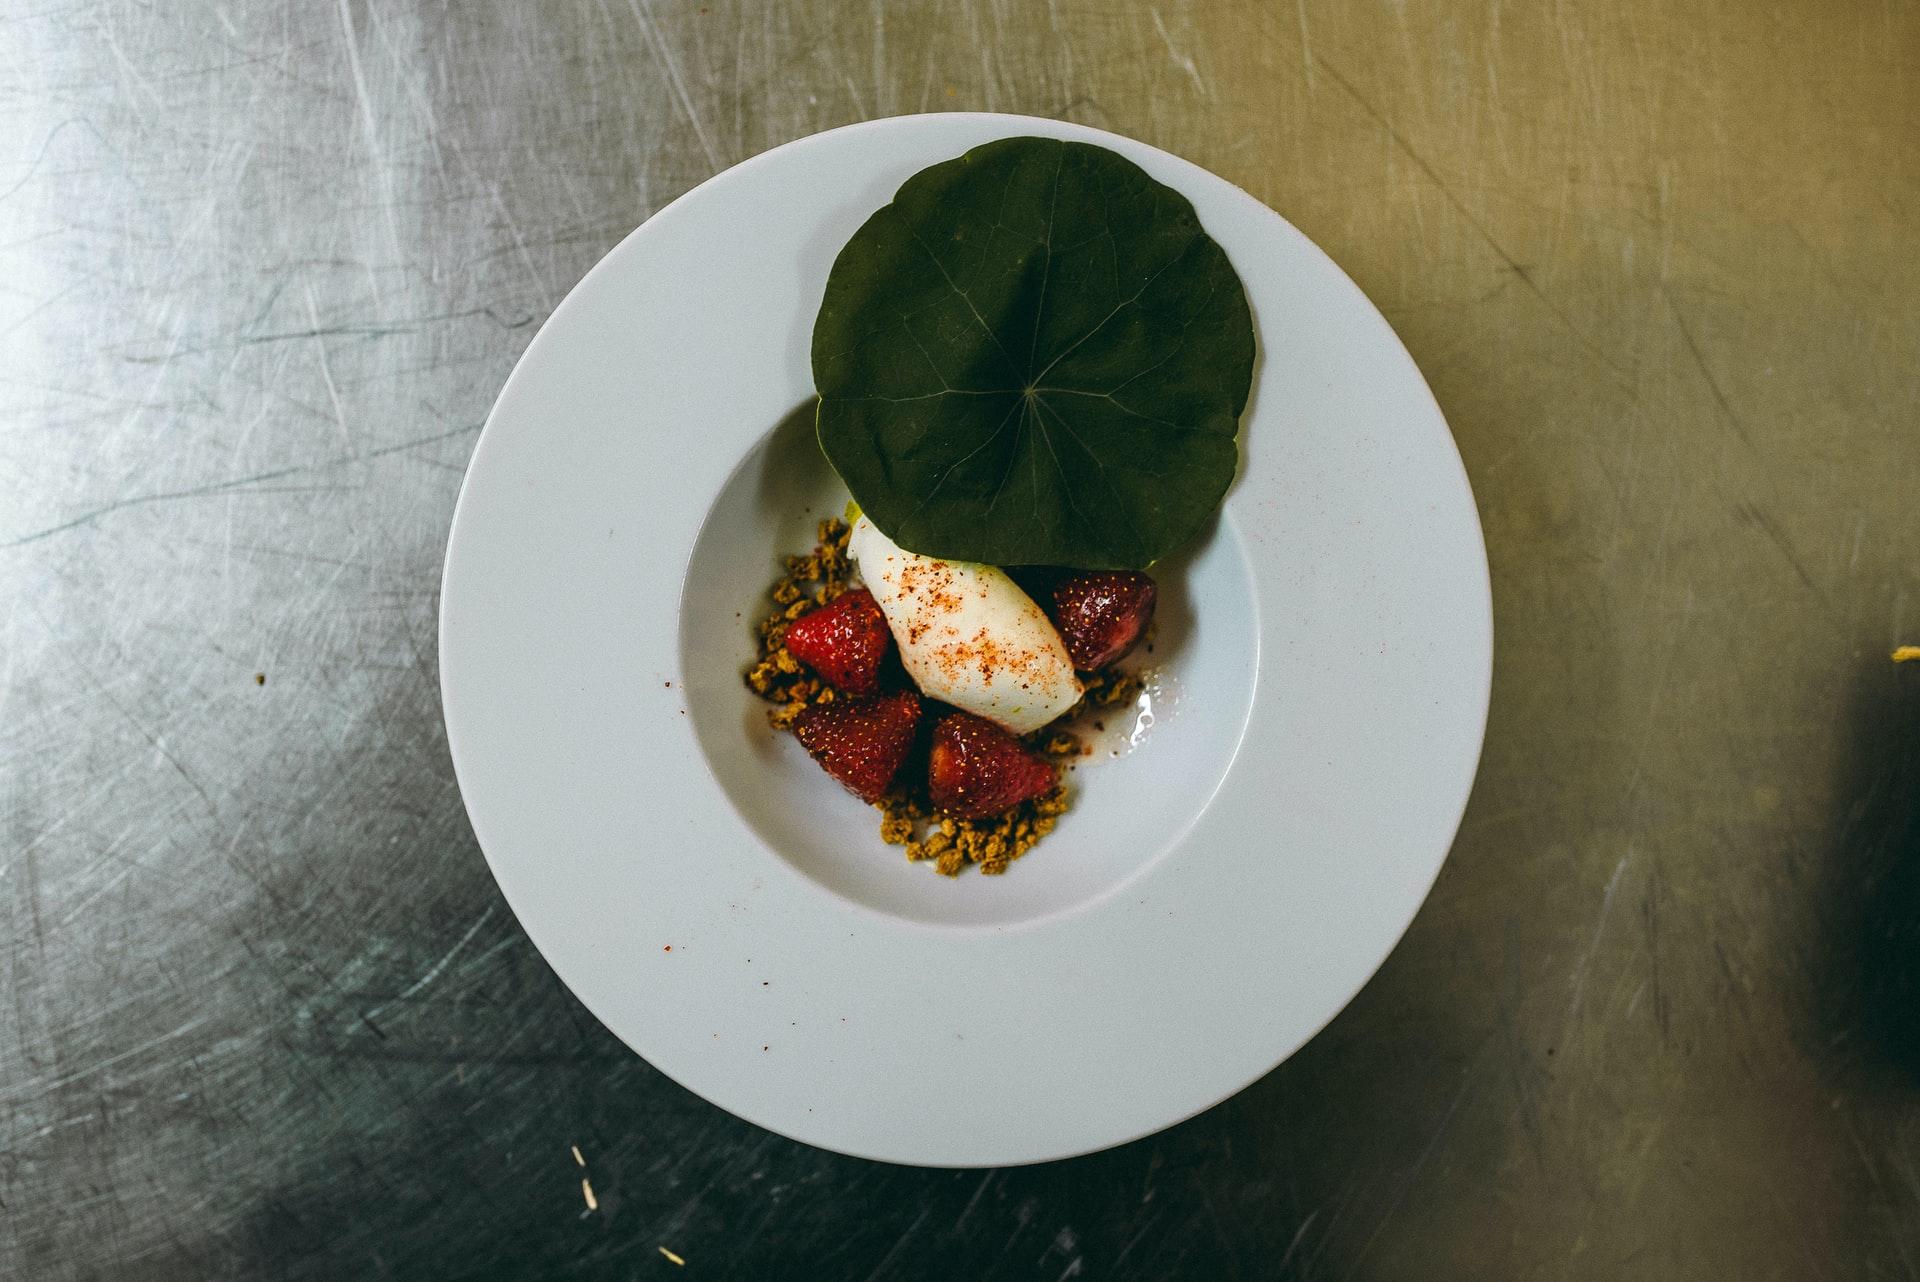 strawberry panna cotta in white bowl